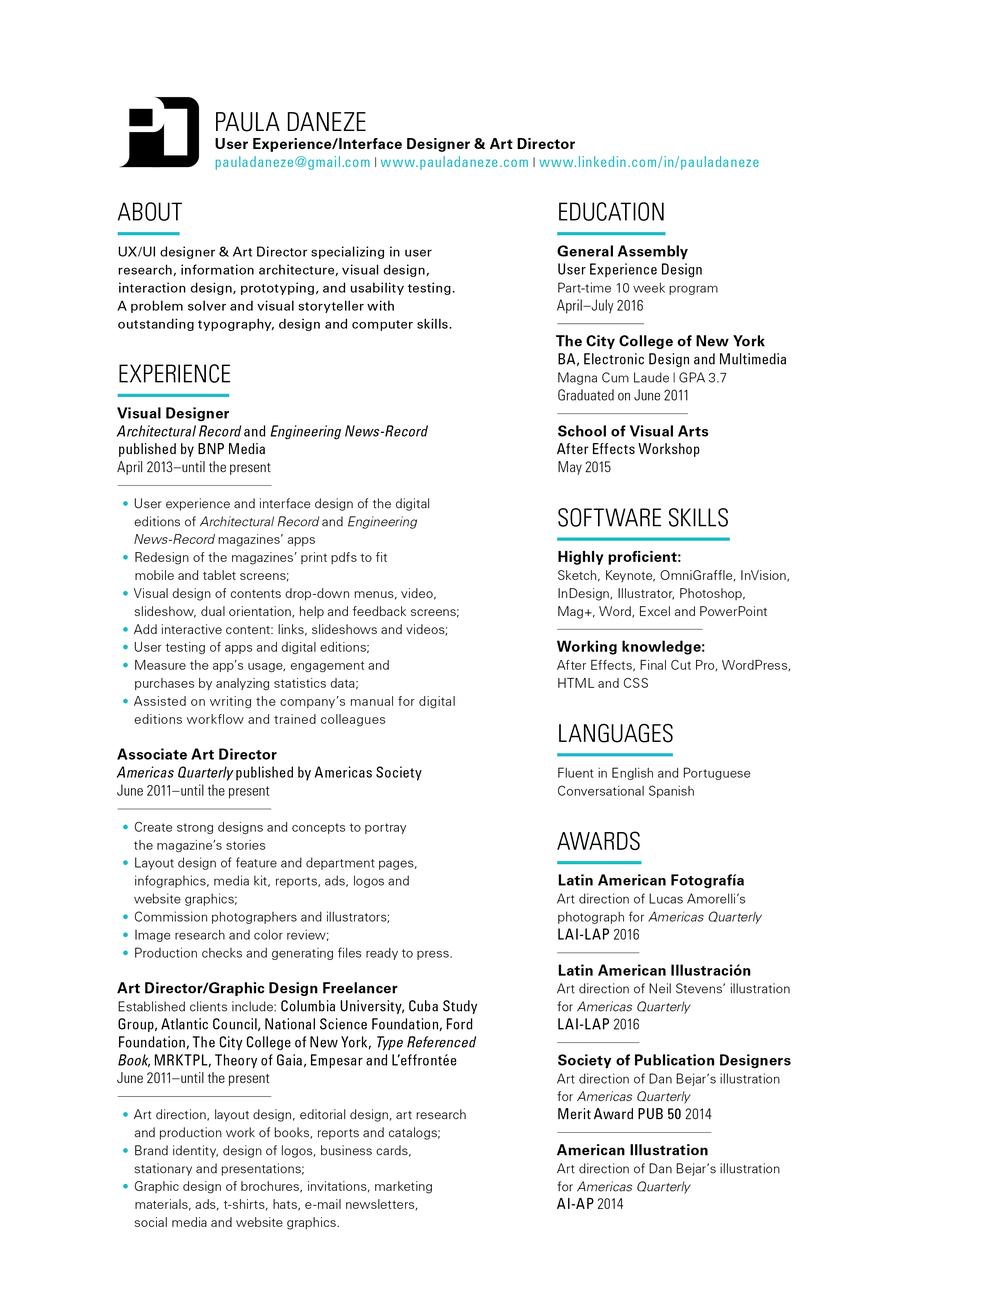 Resume User Experience Resume user experience resume paula daneze for ui daneze